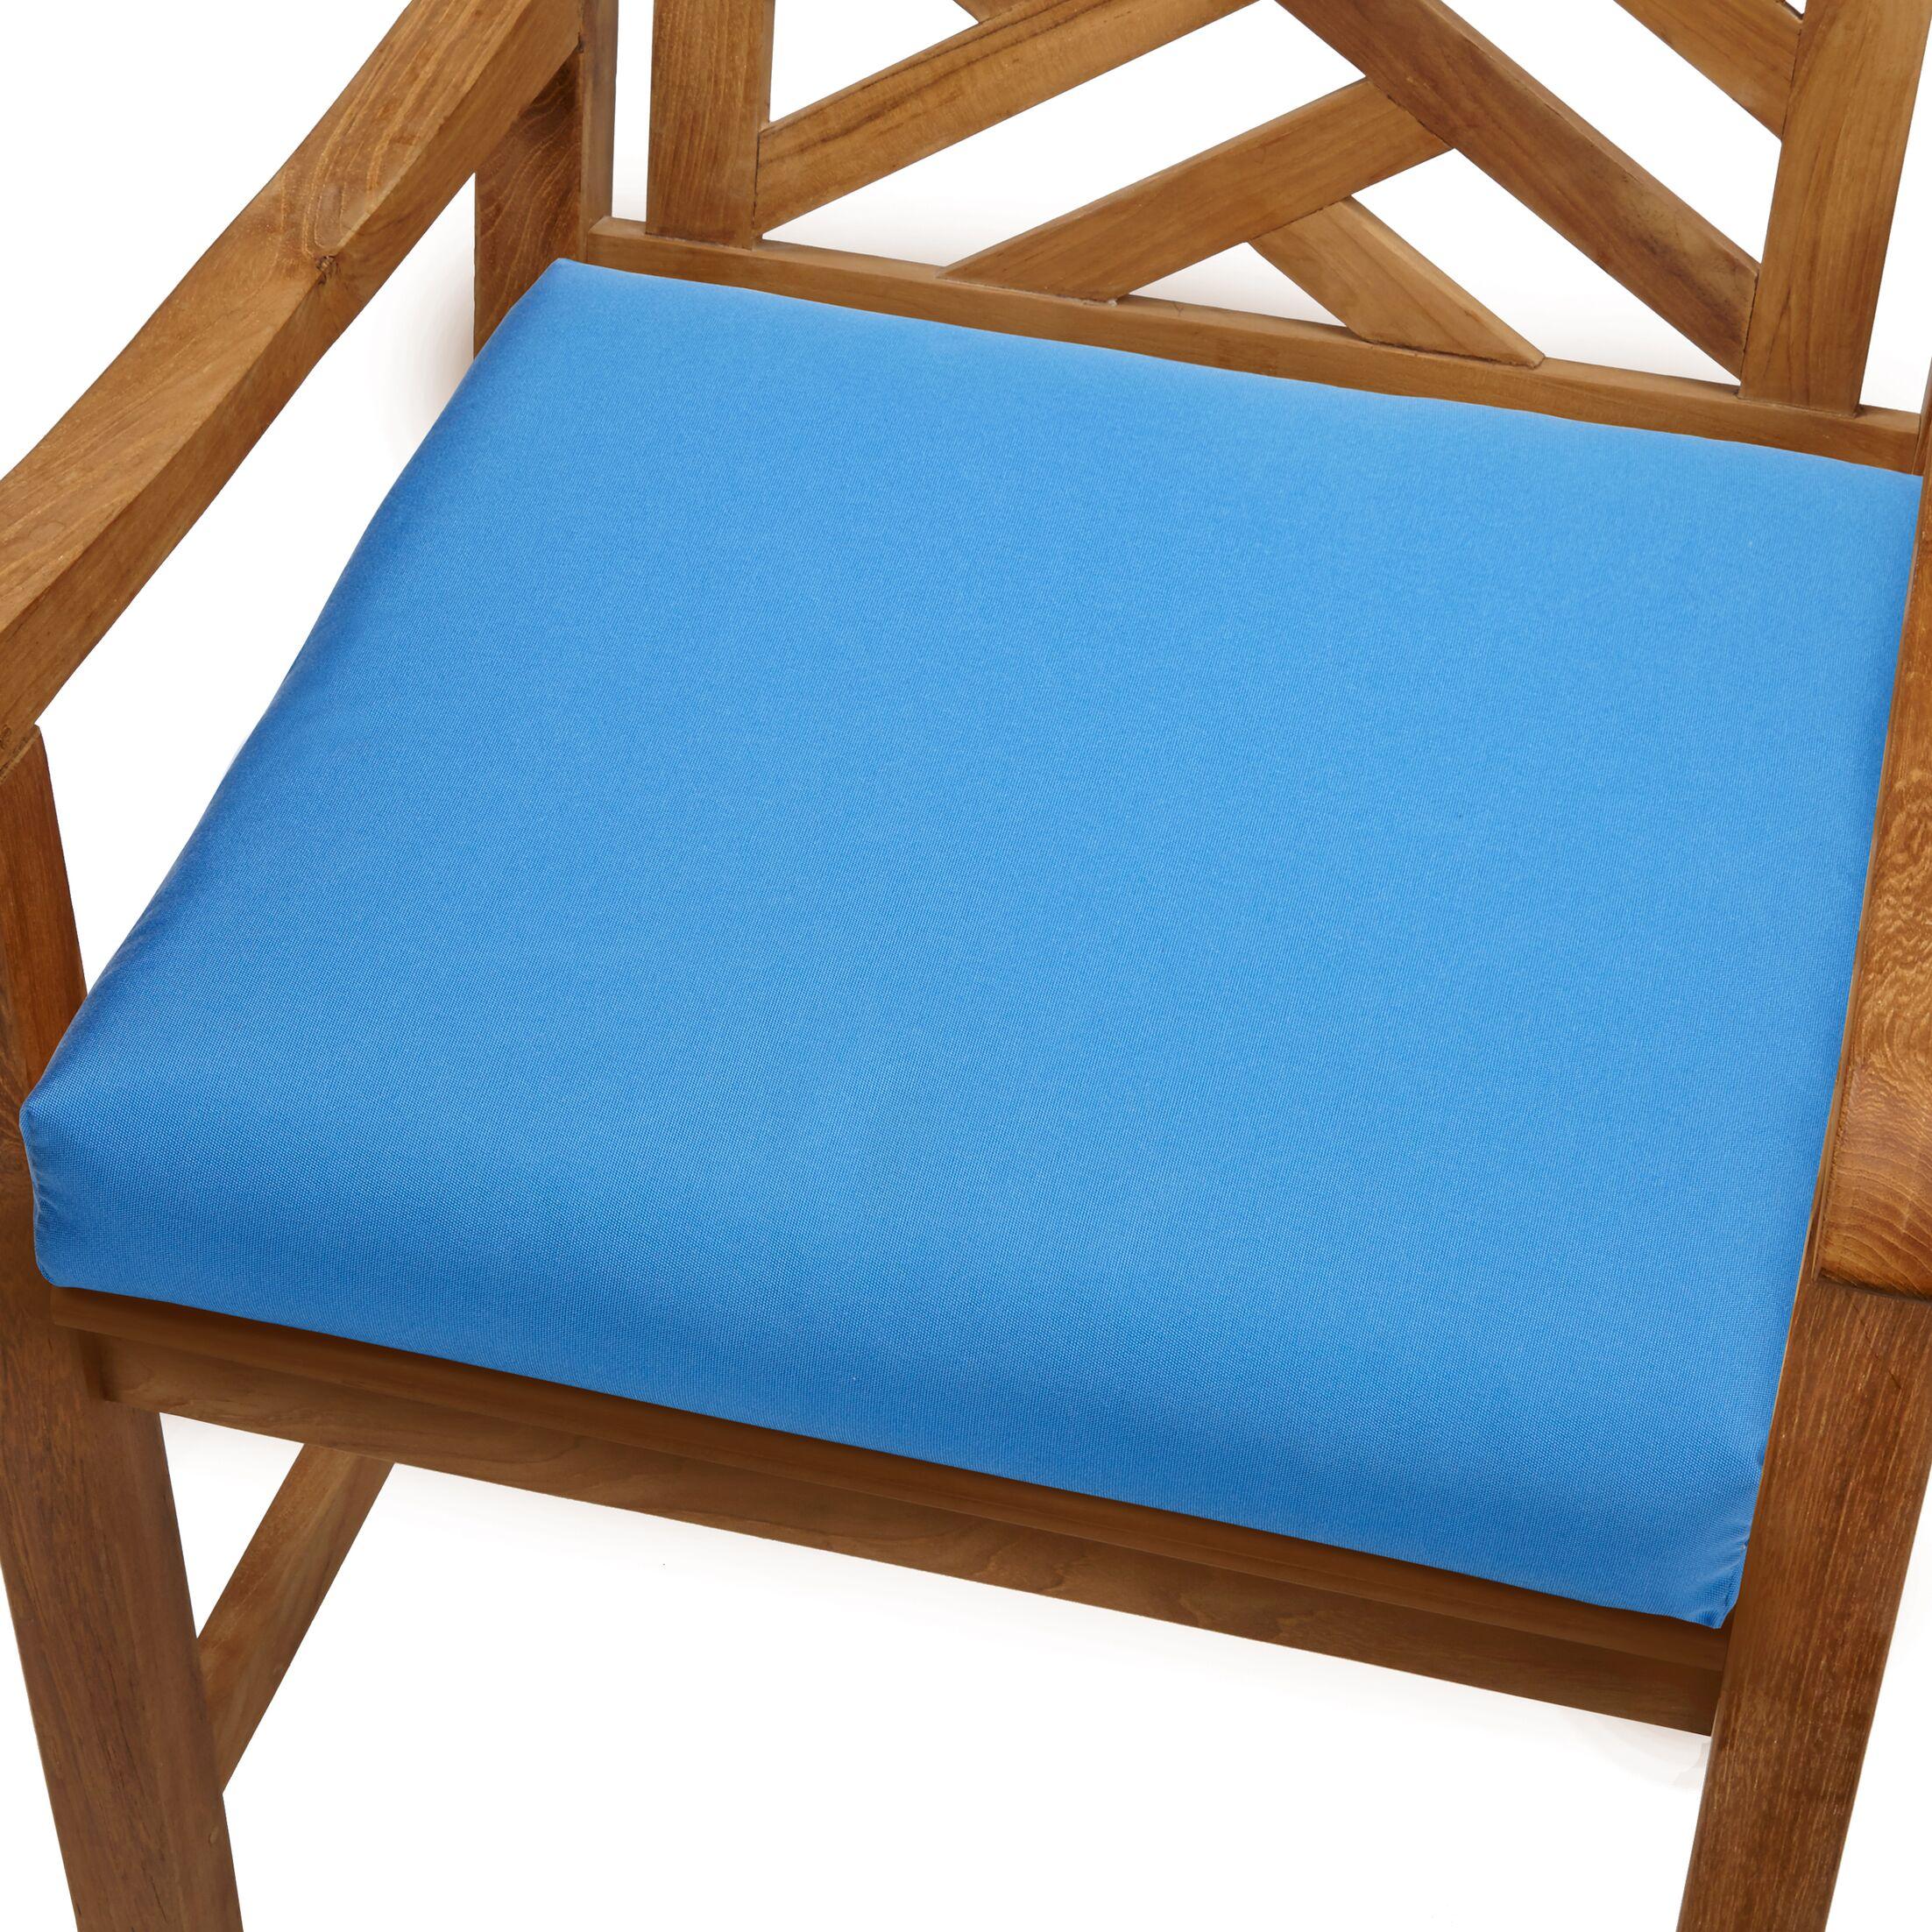 Mcclain Indoor/Outdoor Sunbrella Dining Chair Cushion Fabric: Capri Blue, Size: 19